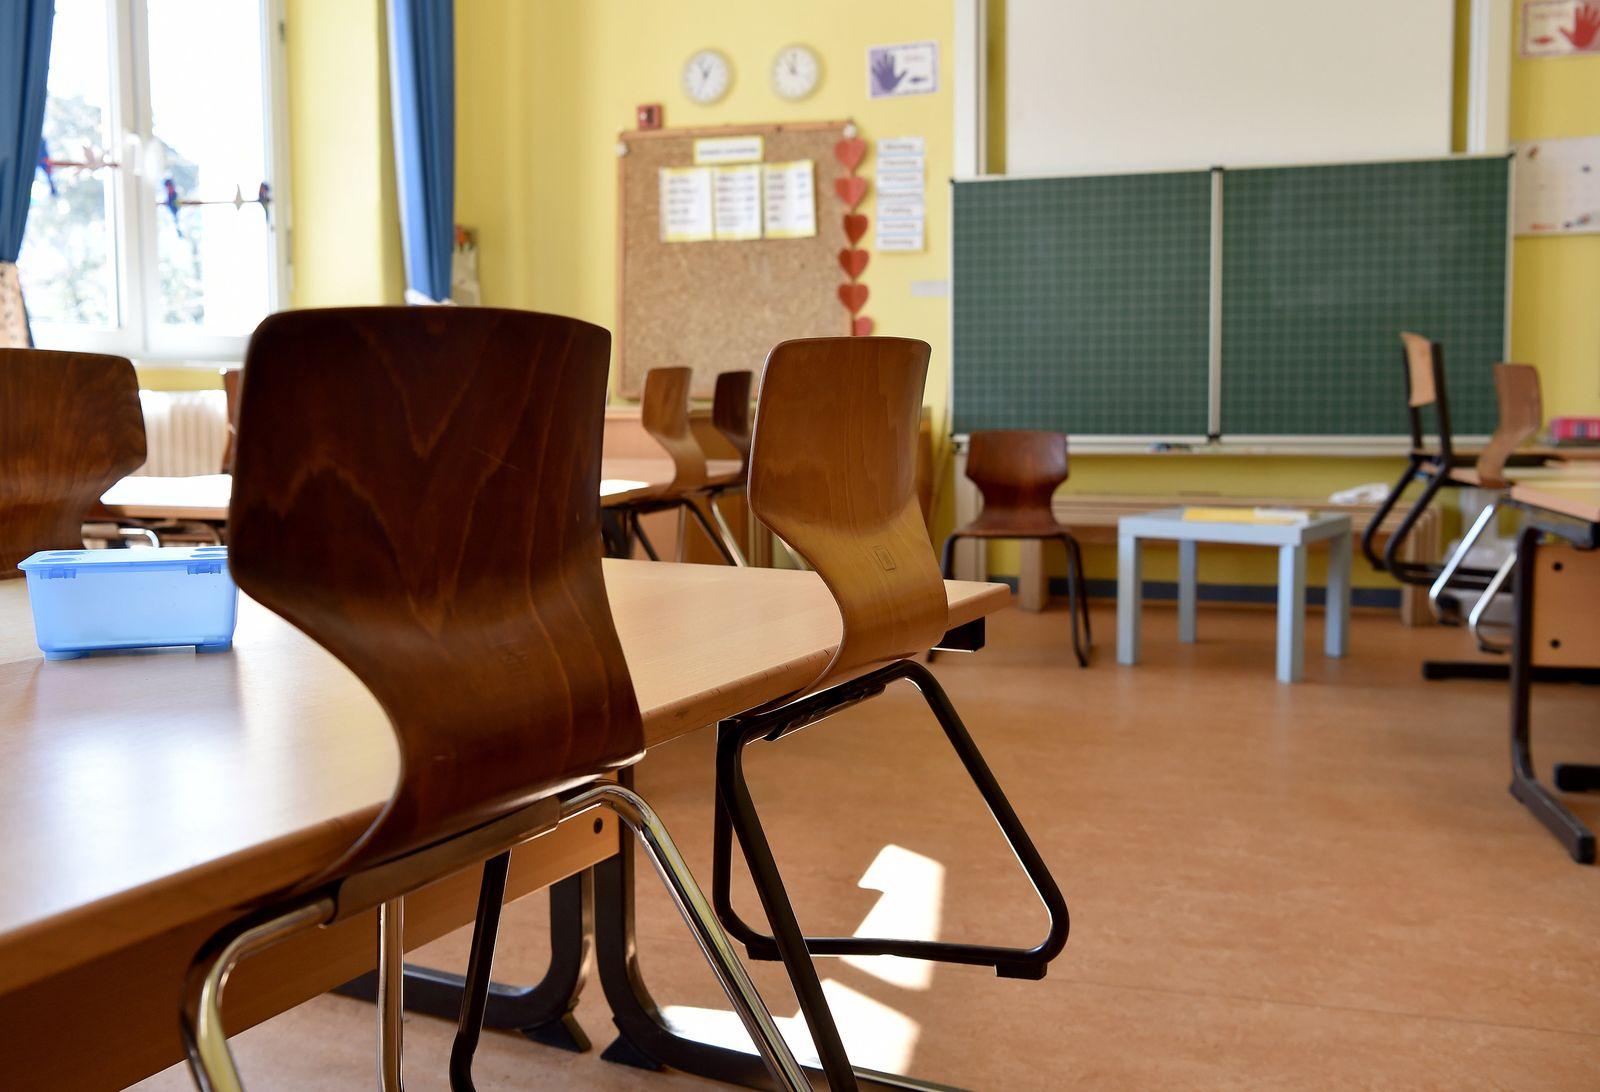 Coronavirus - Grundschule in Essen